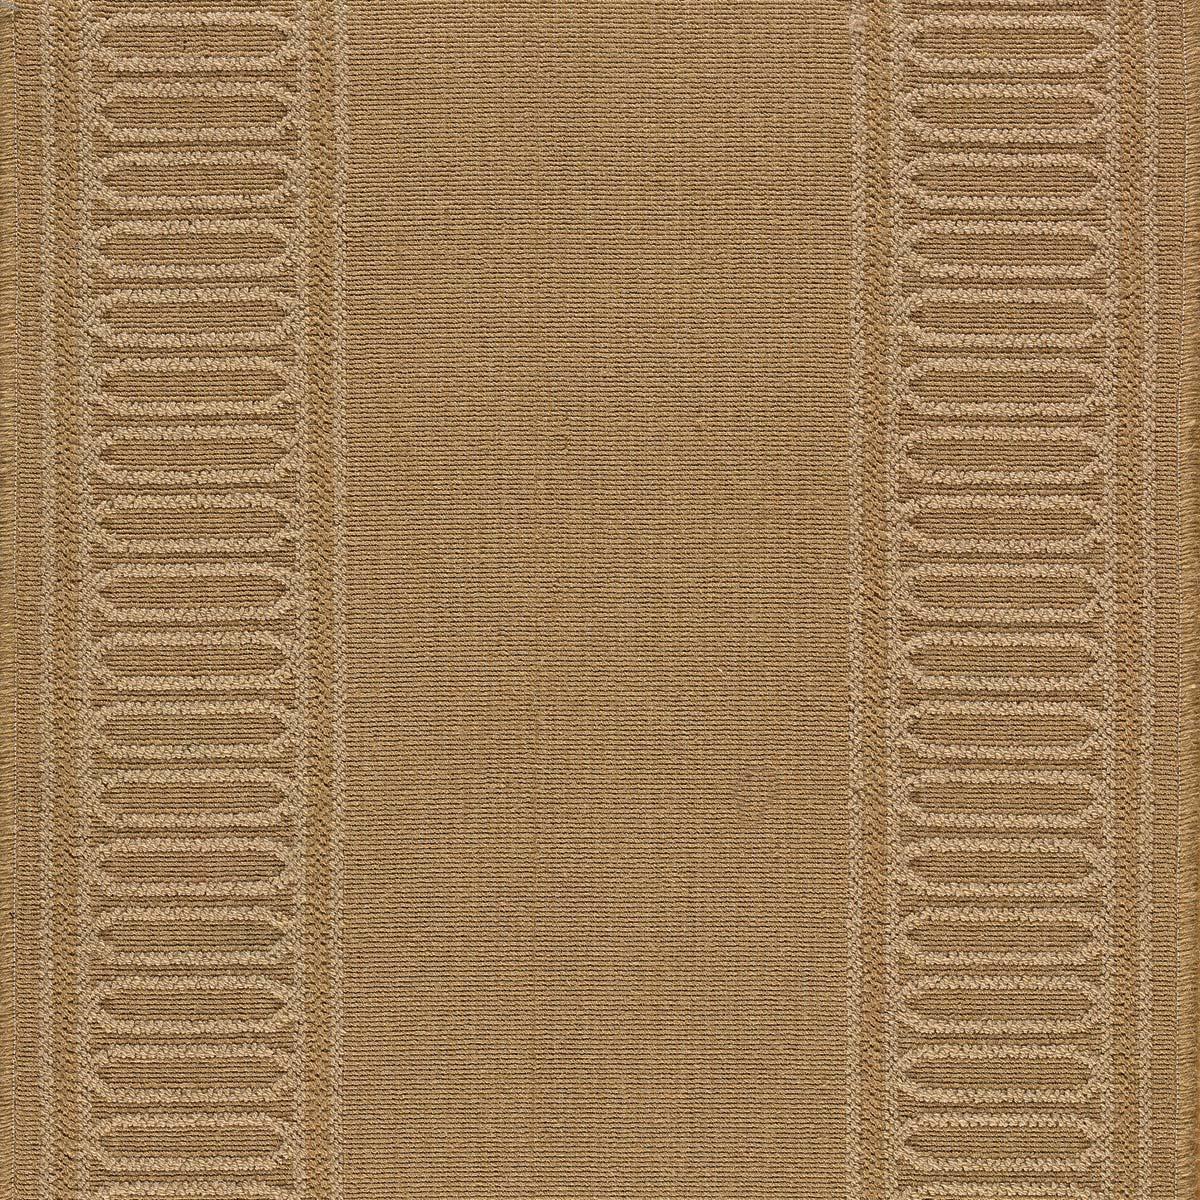 St Bernard Border Geometric Carpets Collection Tim